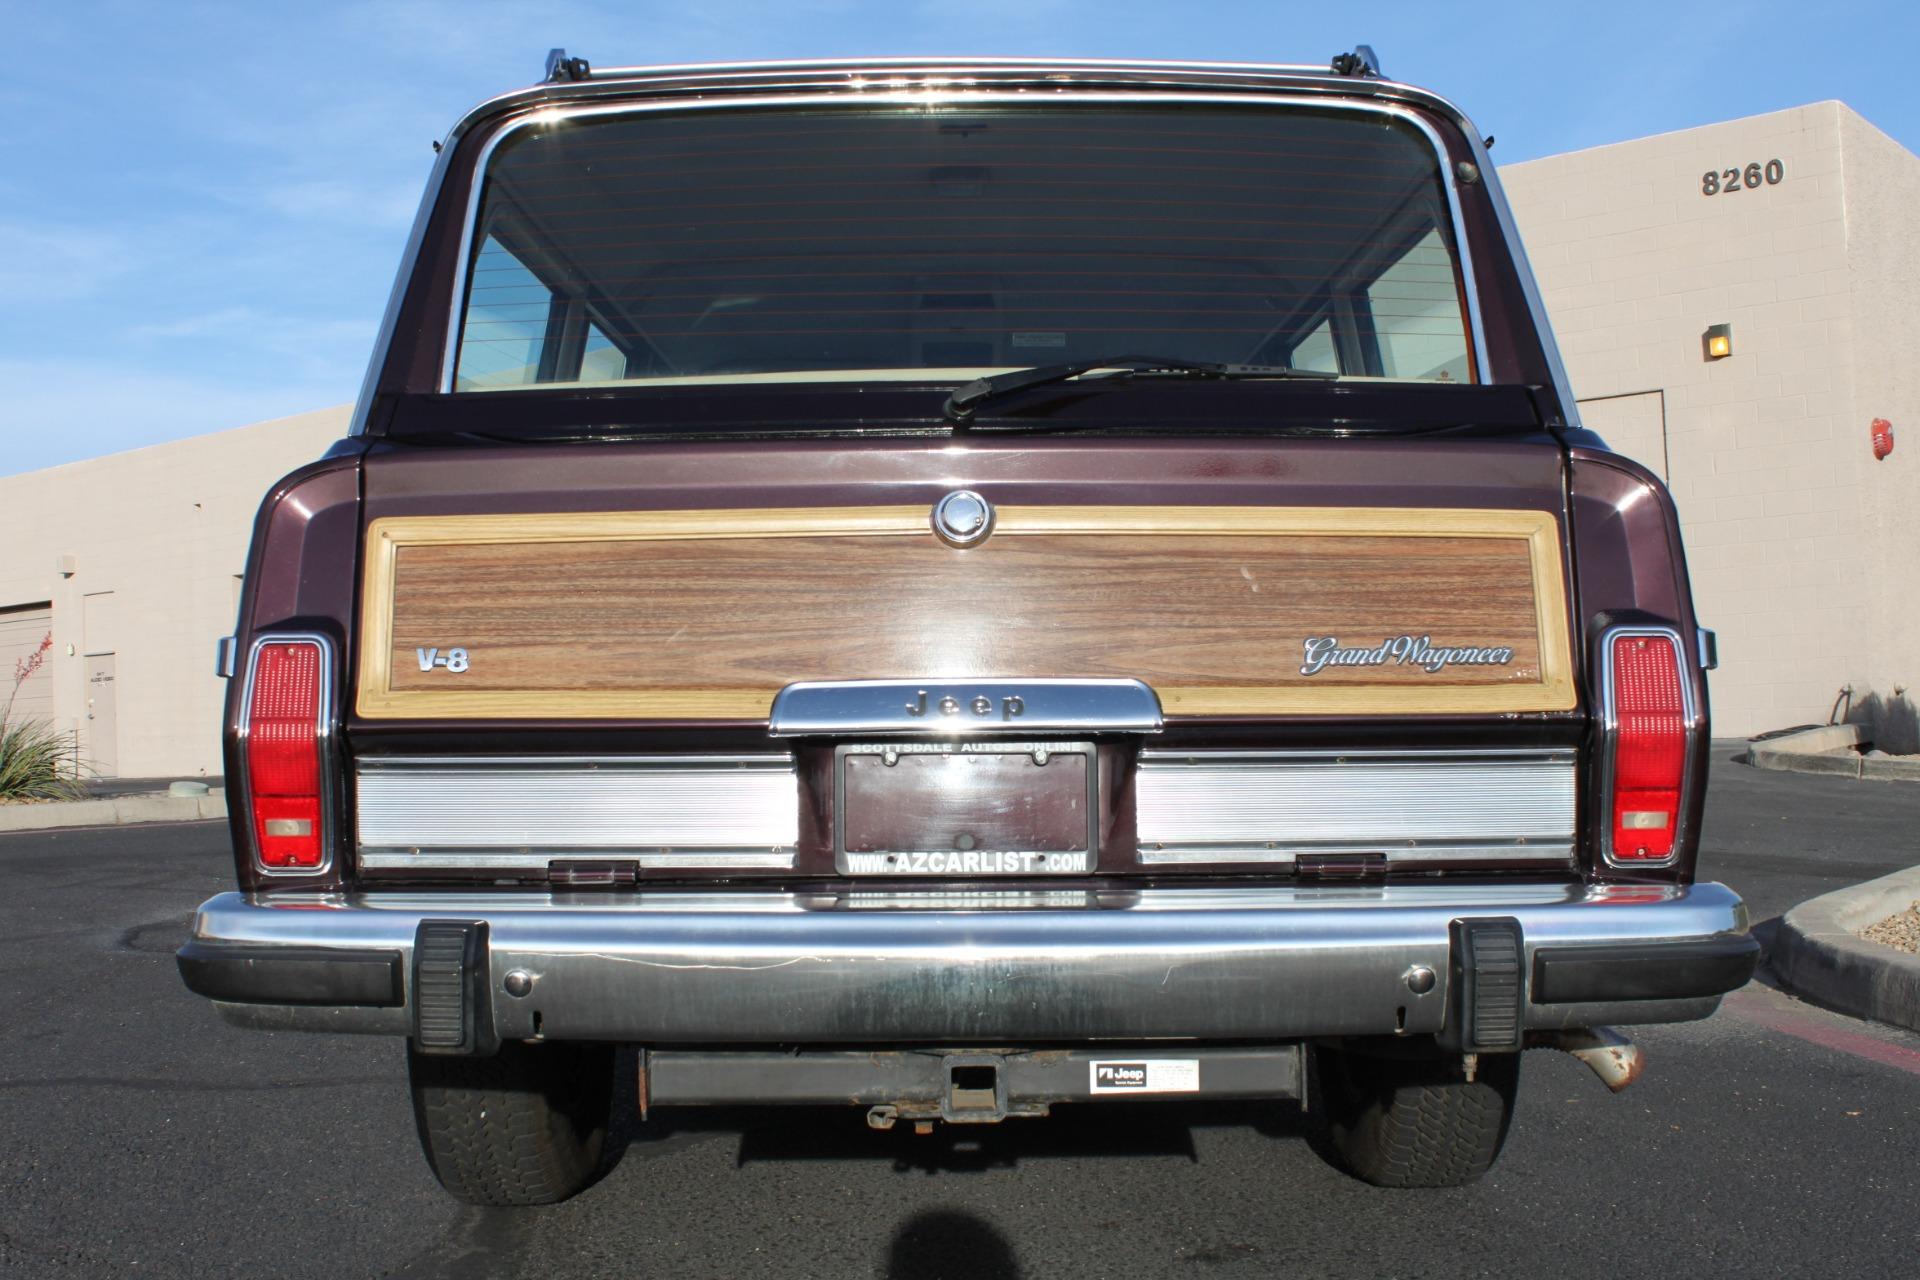 Used-1990-Jeep-Grand-Wagoneer-4X4-Mopar